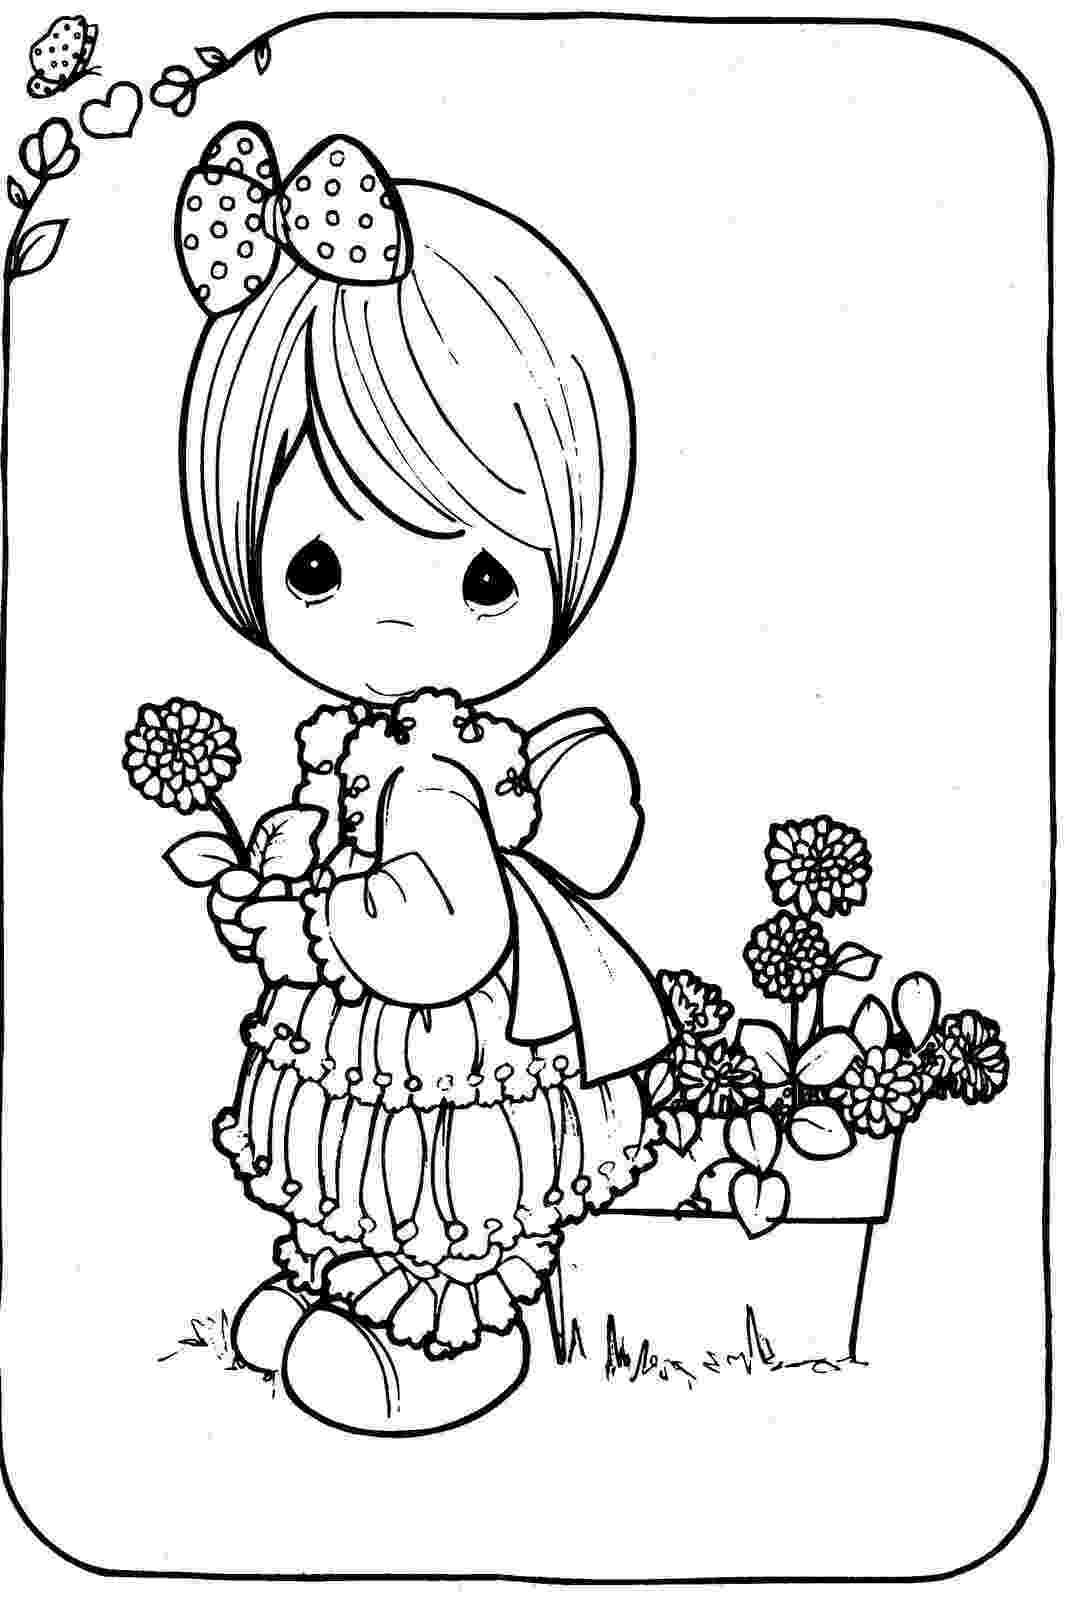 precious moments coloring pages precious moments waiter child coloring precious moments pages coloring